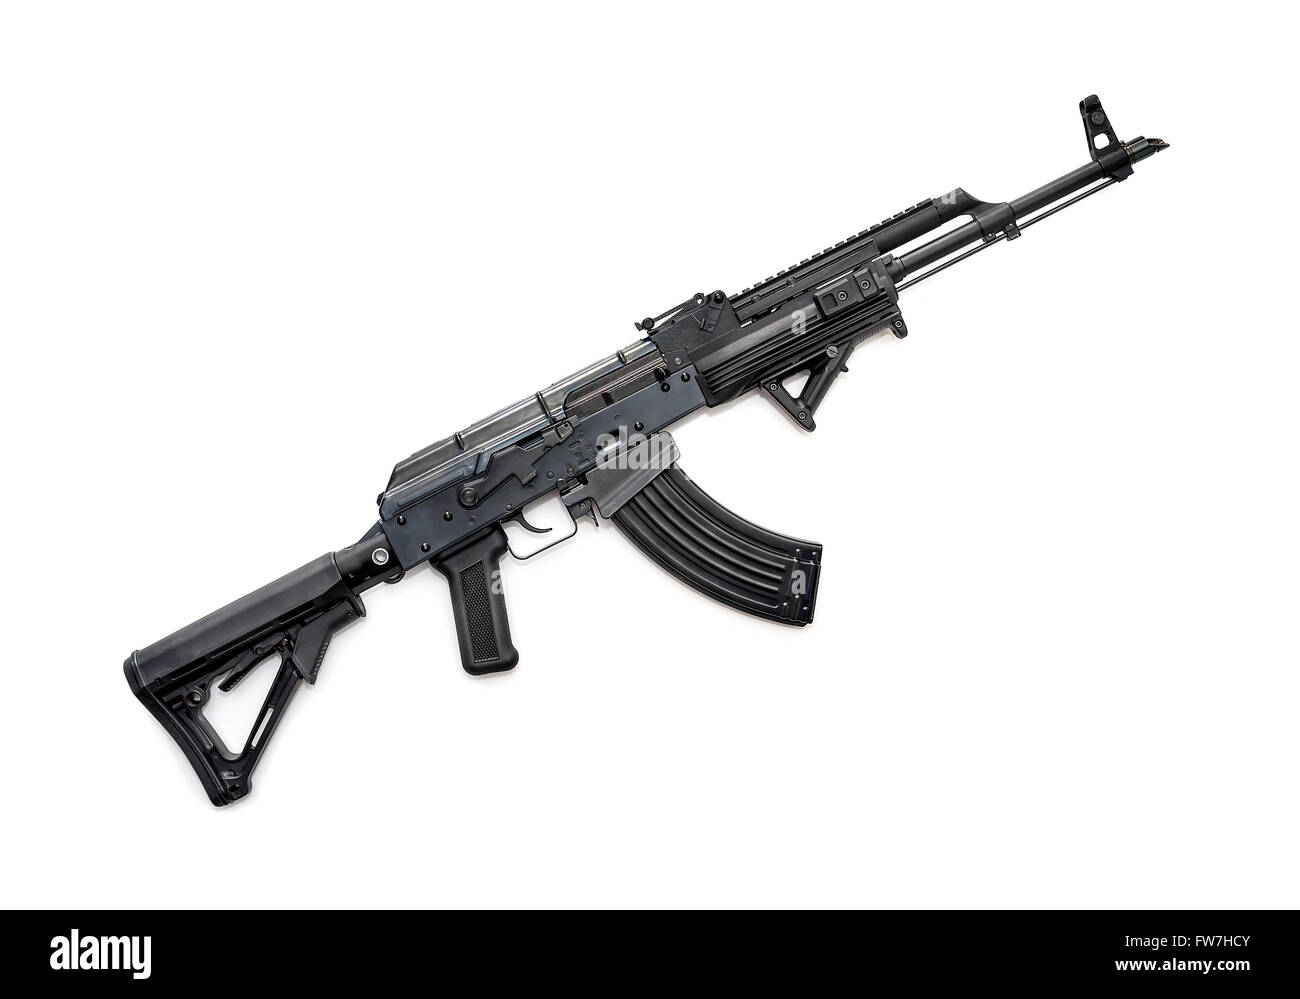 Tactical custom built AK-47 rifle on white background - Stock Image